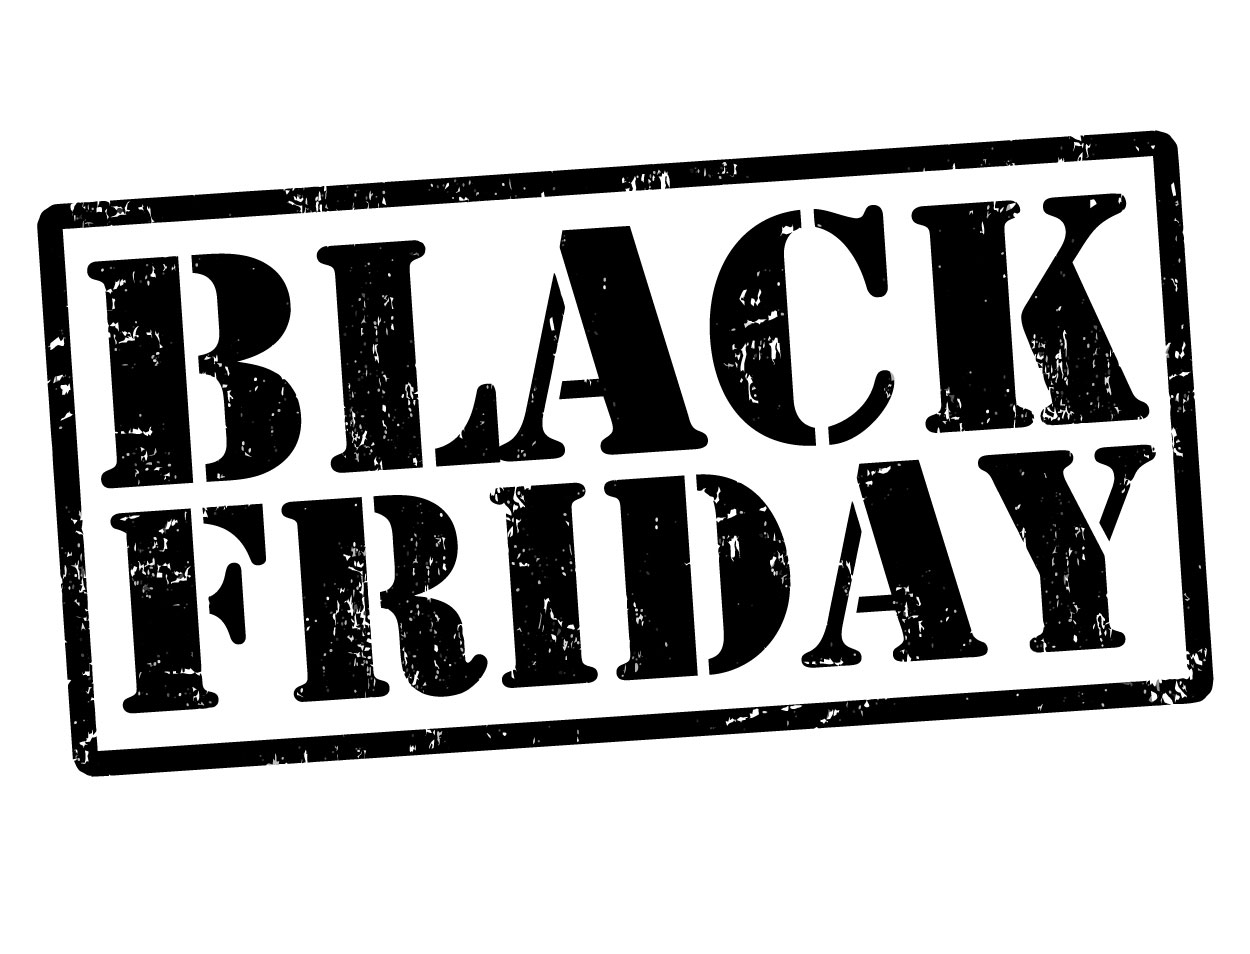 ¡Apróvechate del BLACK FRIDAY!